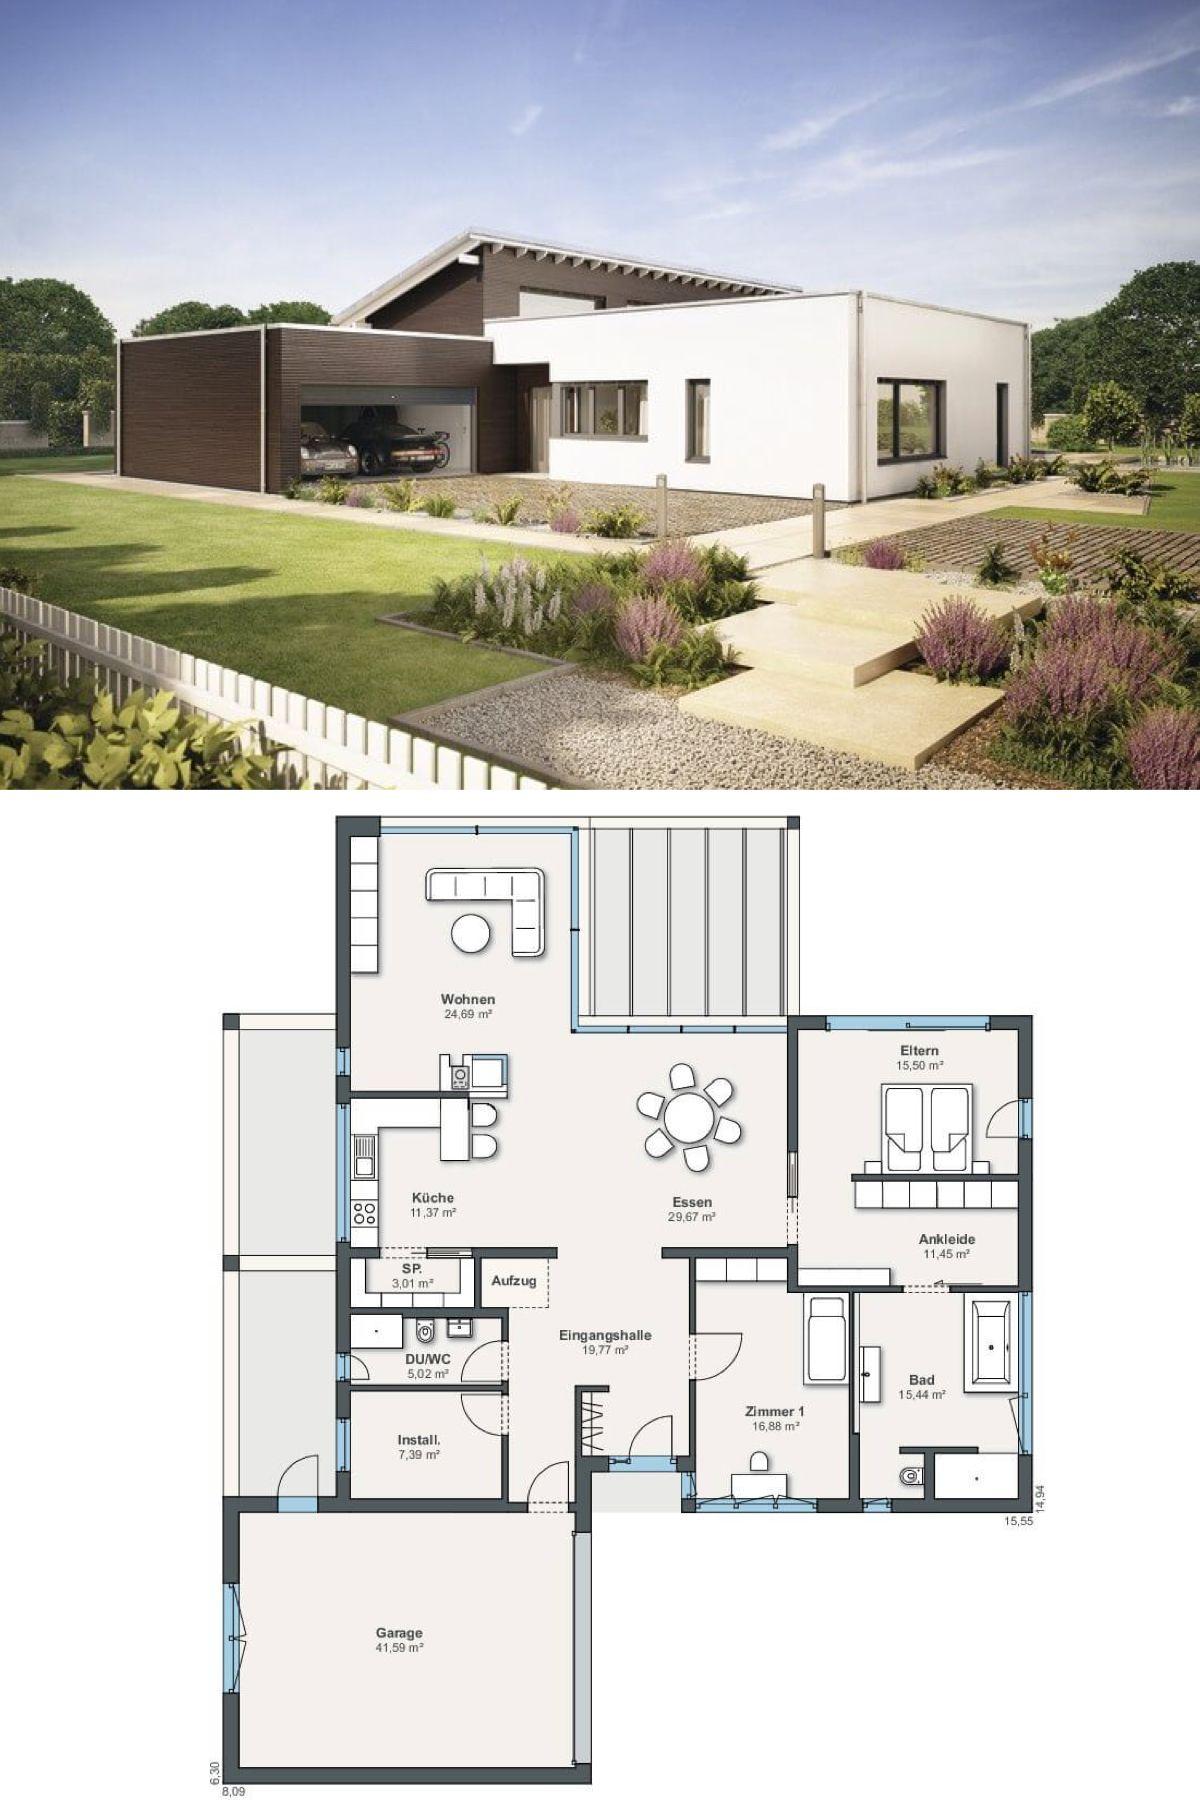 Bungalow Grundriss ebenleben Weberhaus - Haus Ideen auf ...